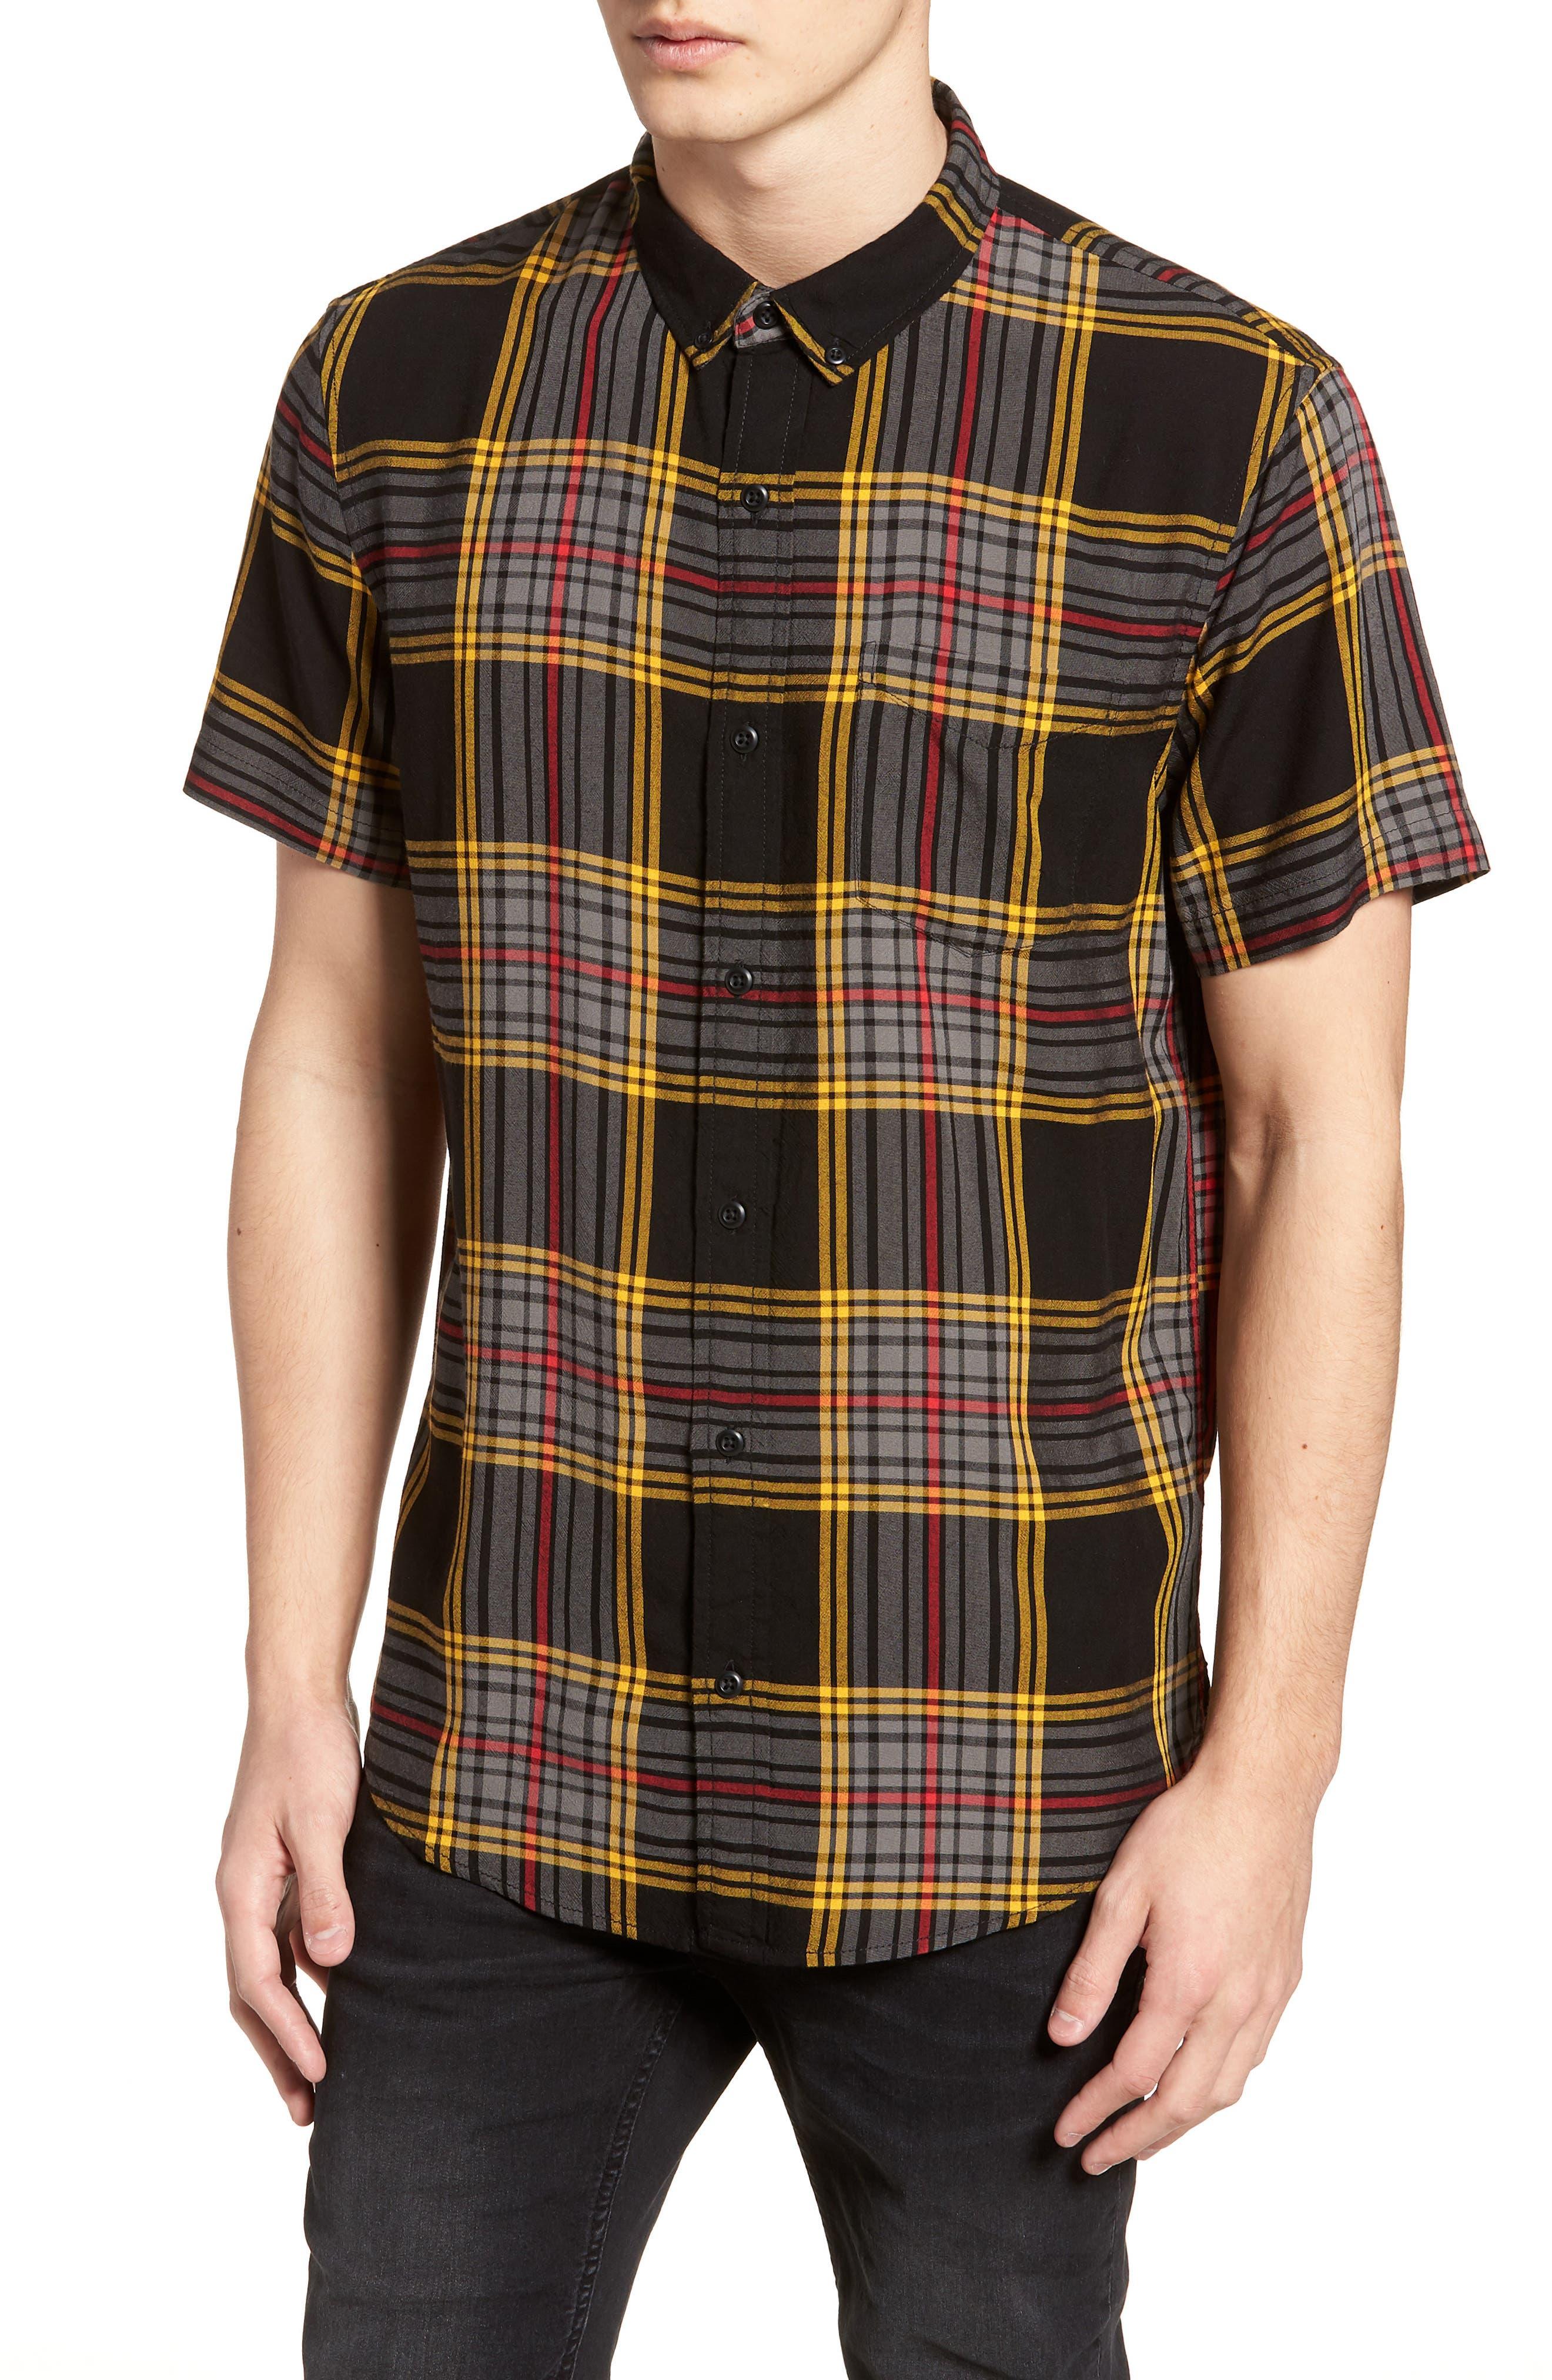 Yarn Dyed Plaid Shirt,                             Main thumbnail 1, color,                             Black Yellow Ethan Plaid